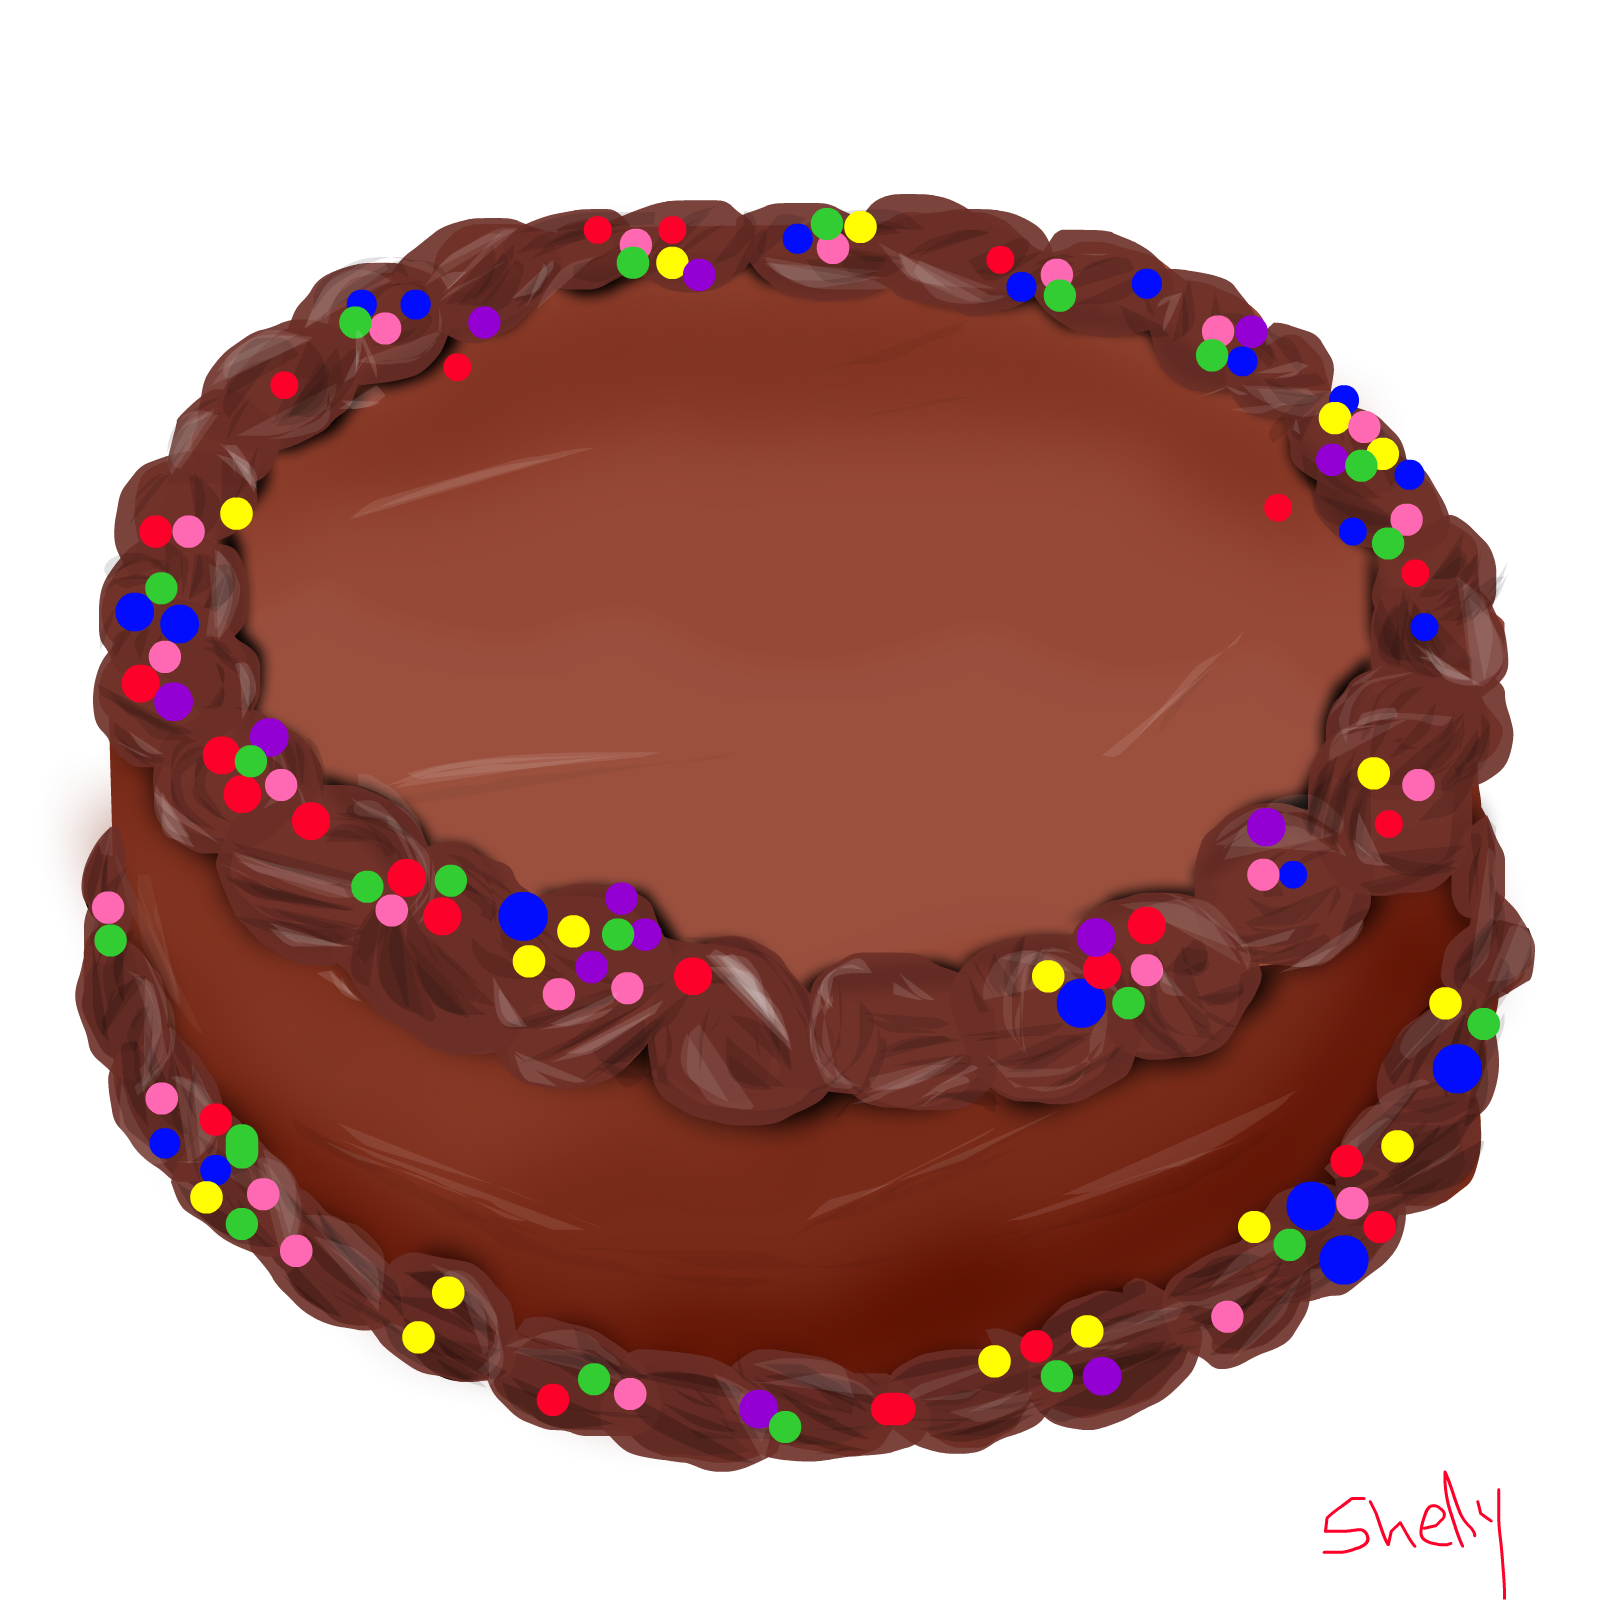 Twitter Cake Chocolate Penises